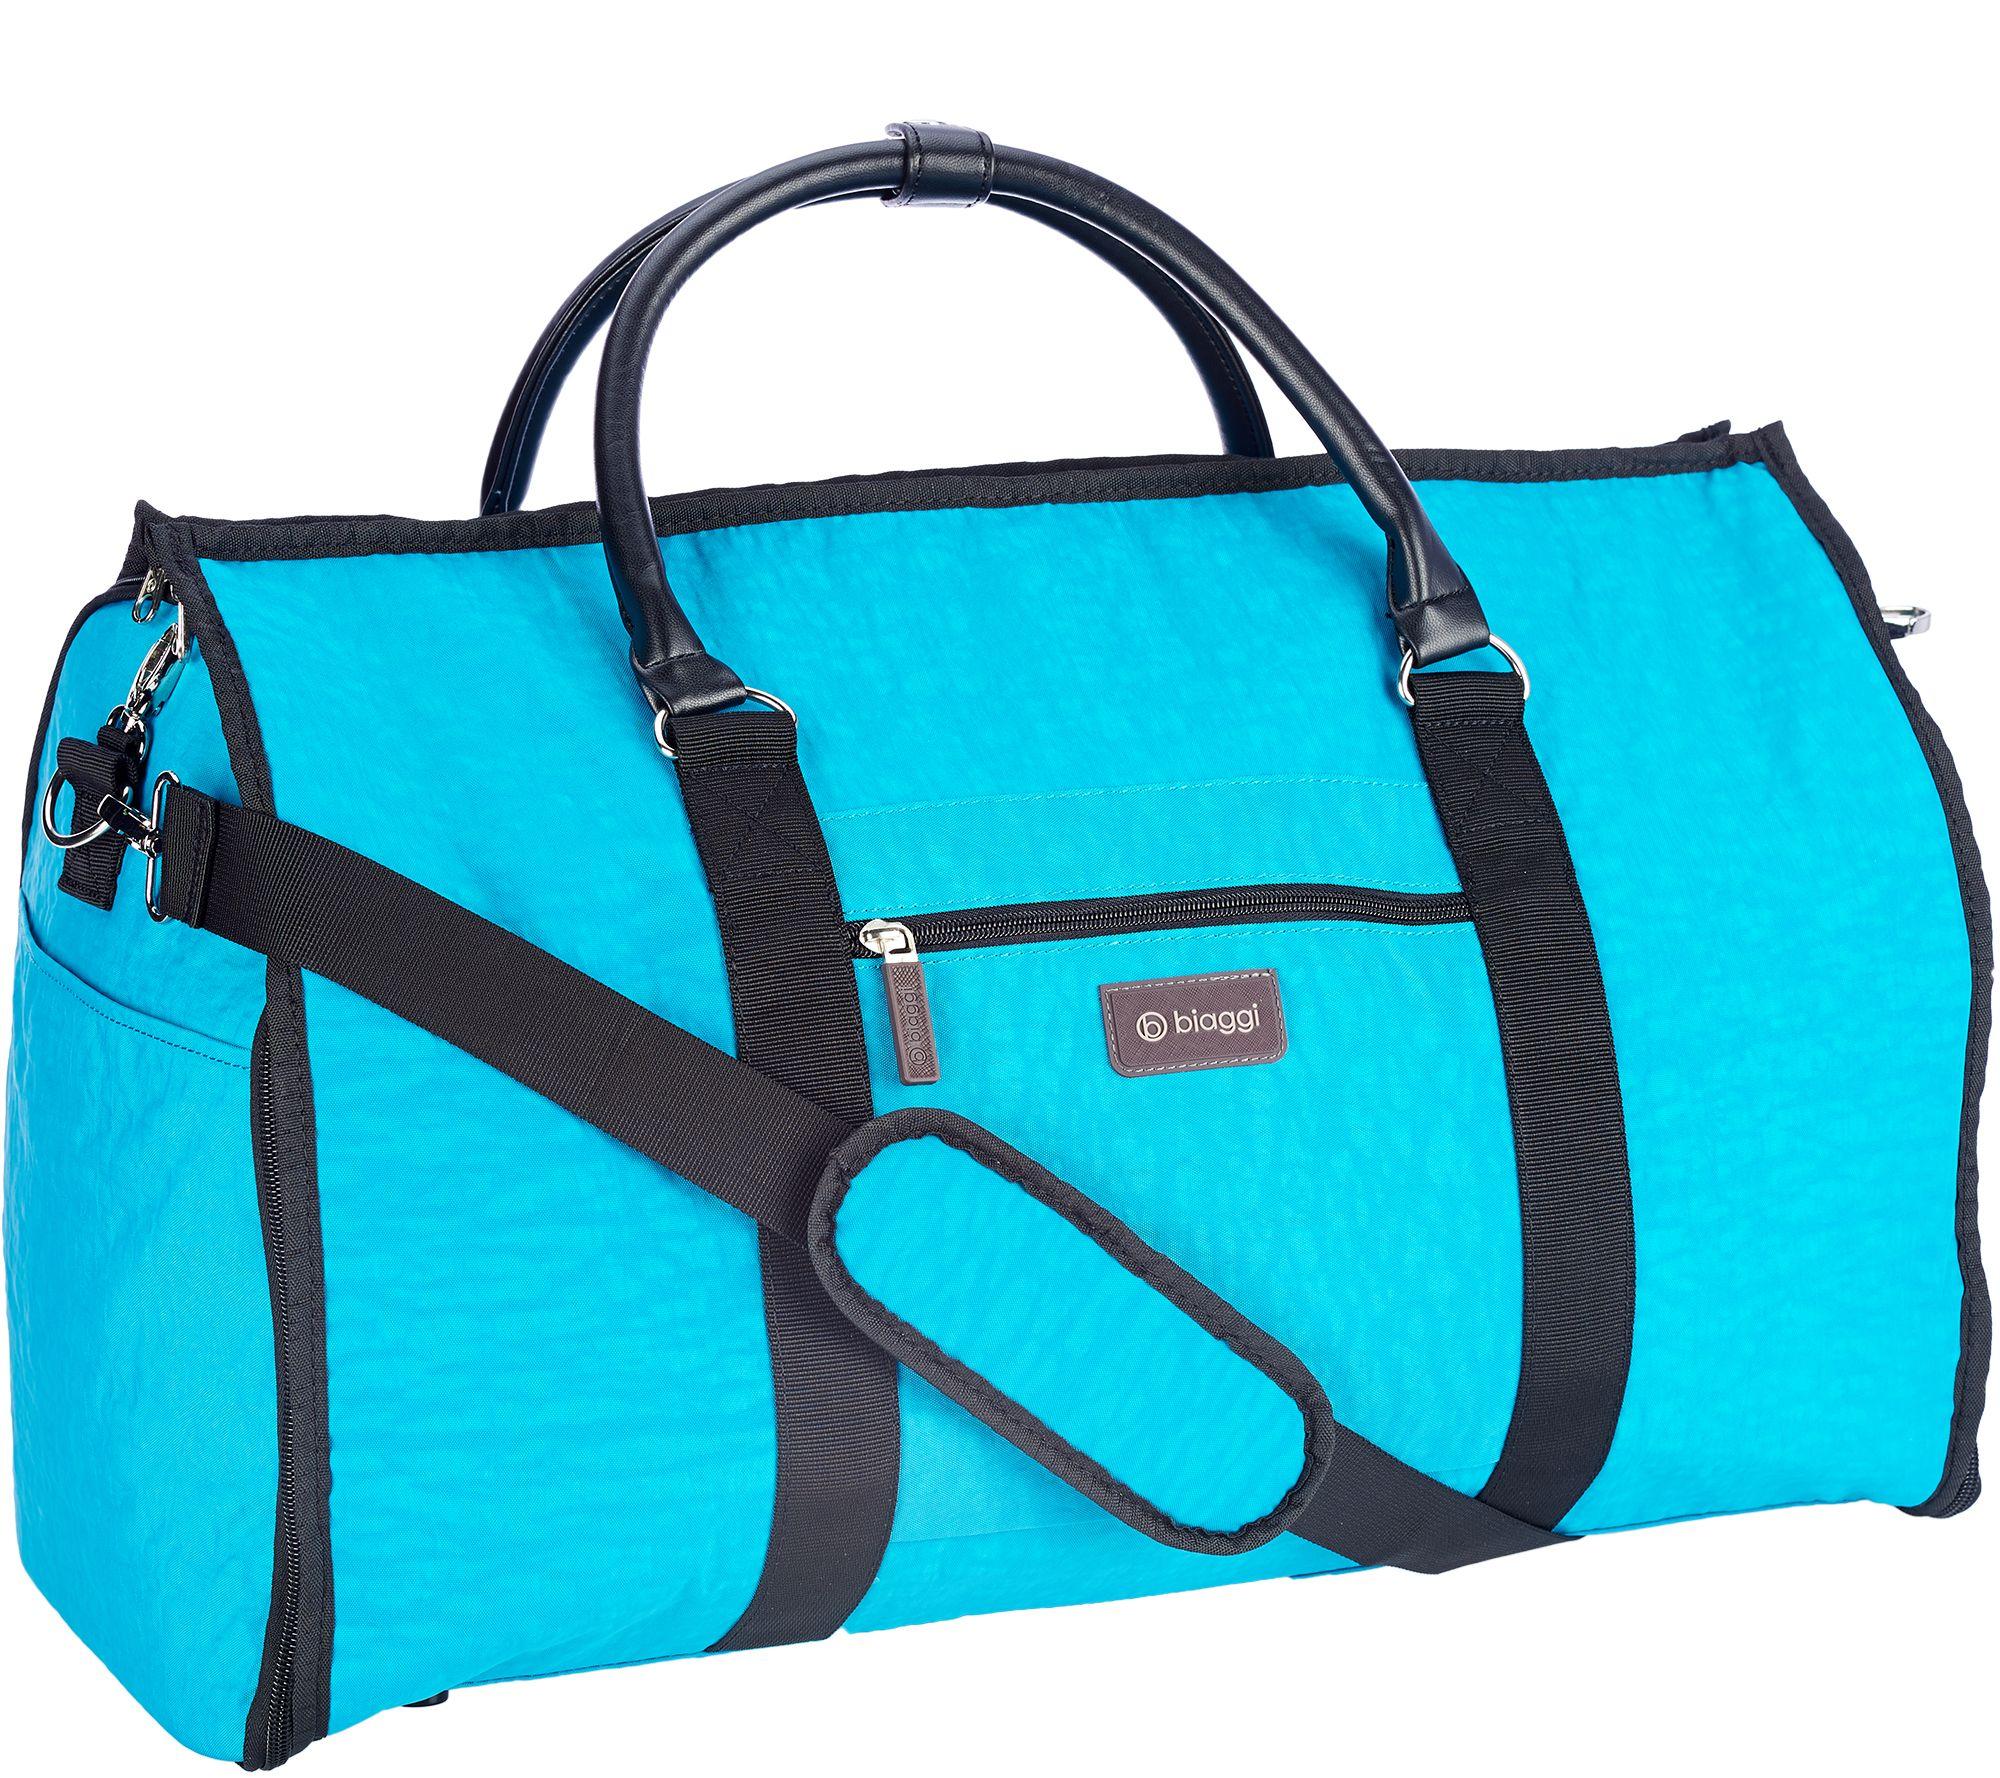 Luggage — QVC.com